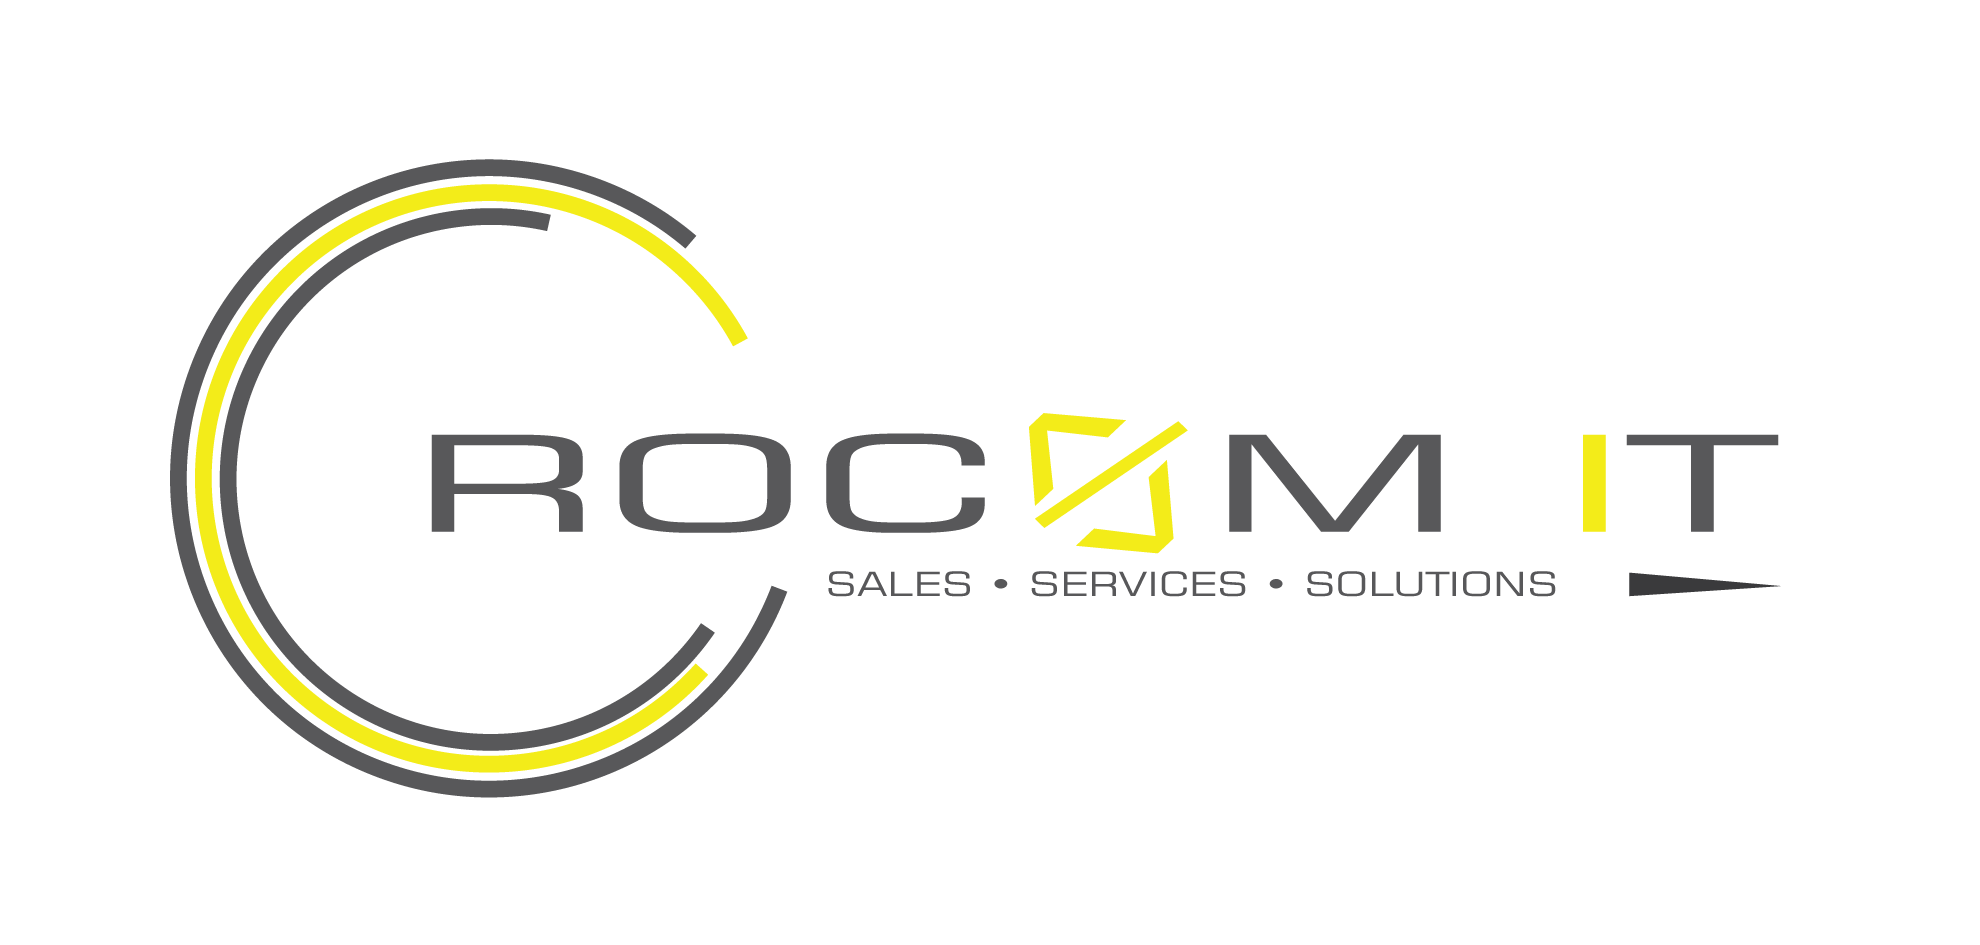 ROCOM IT SERVICES